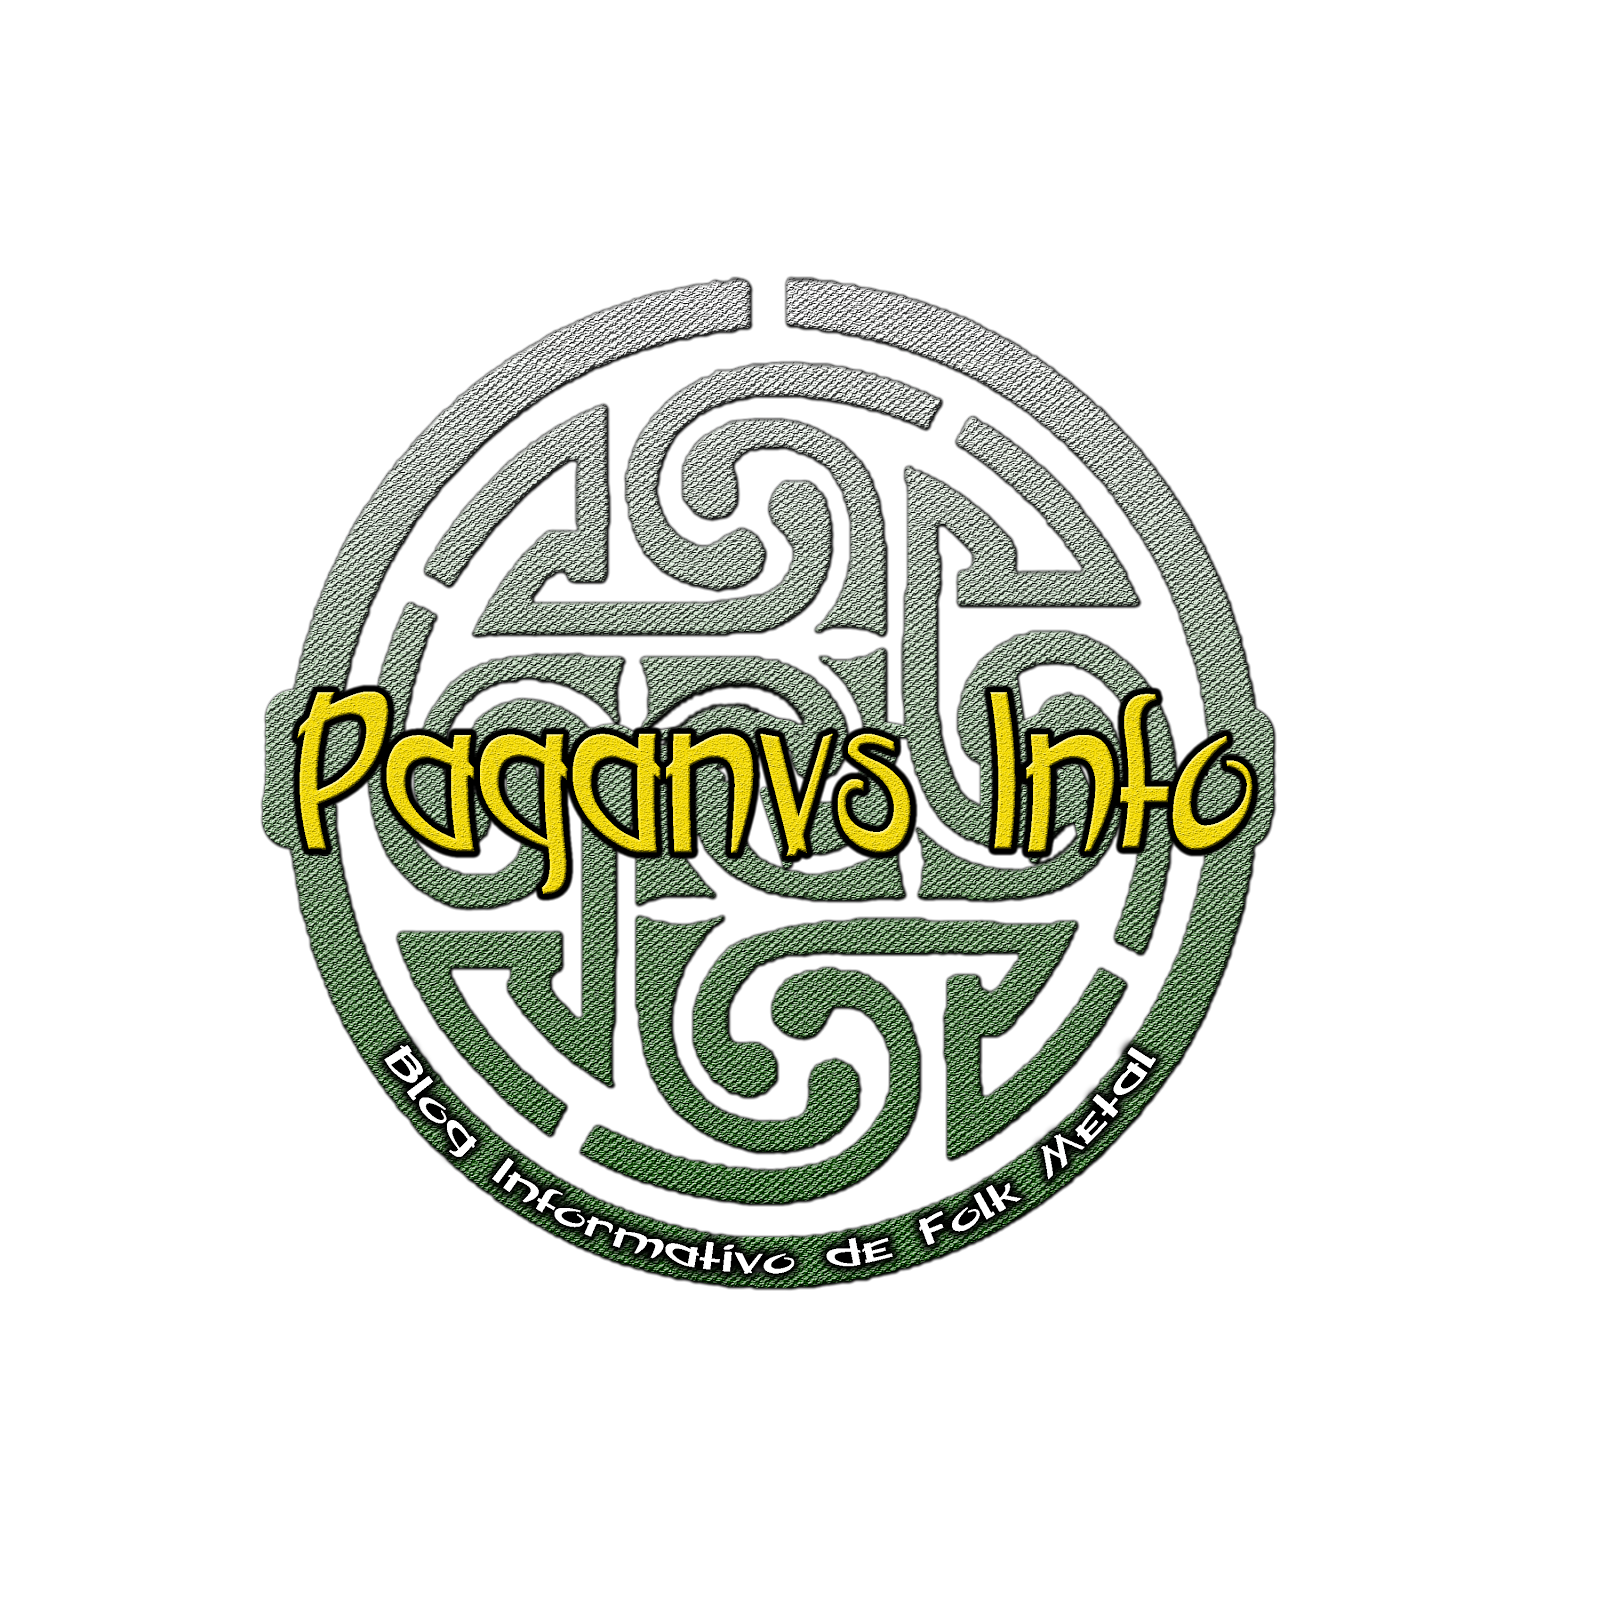 .-*Paganvs Info*-.